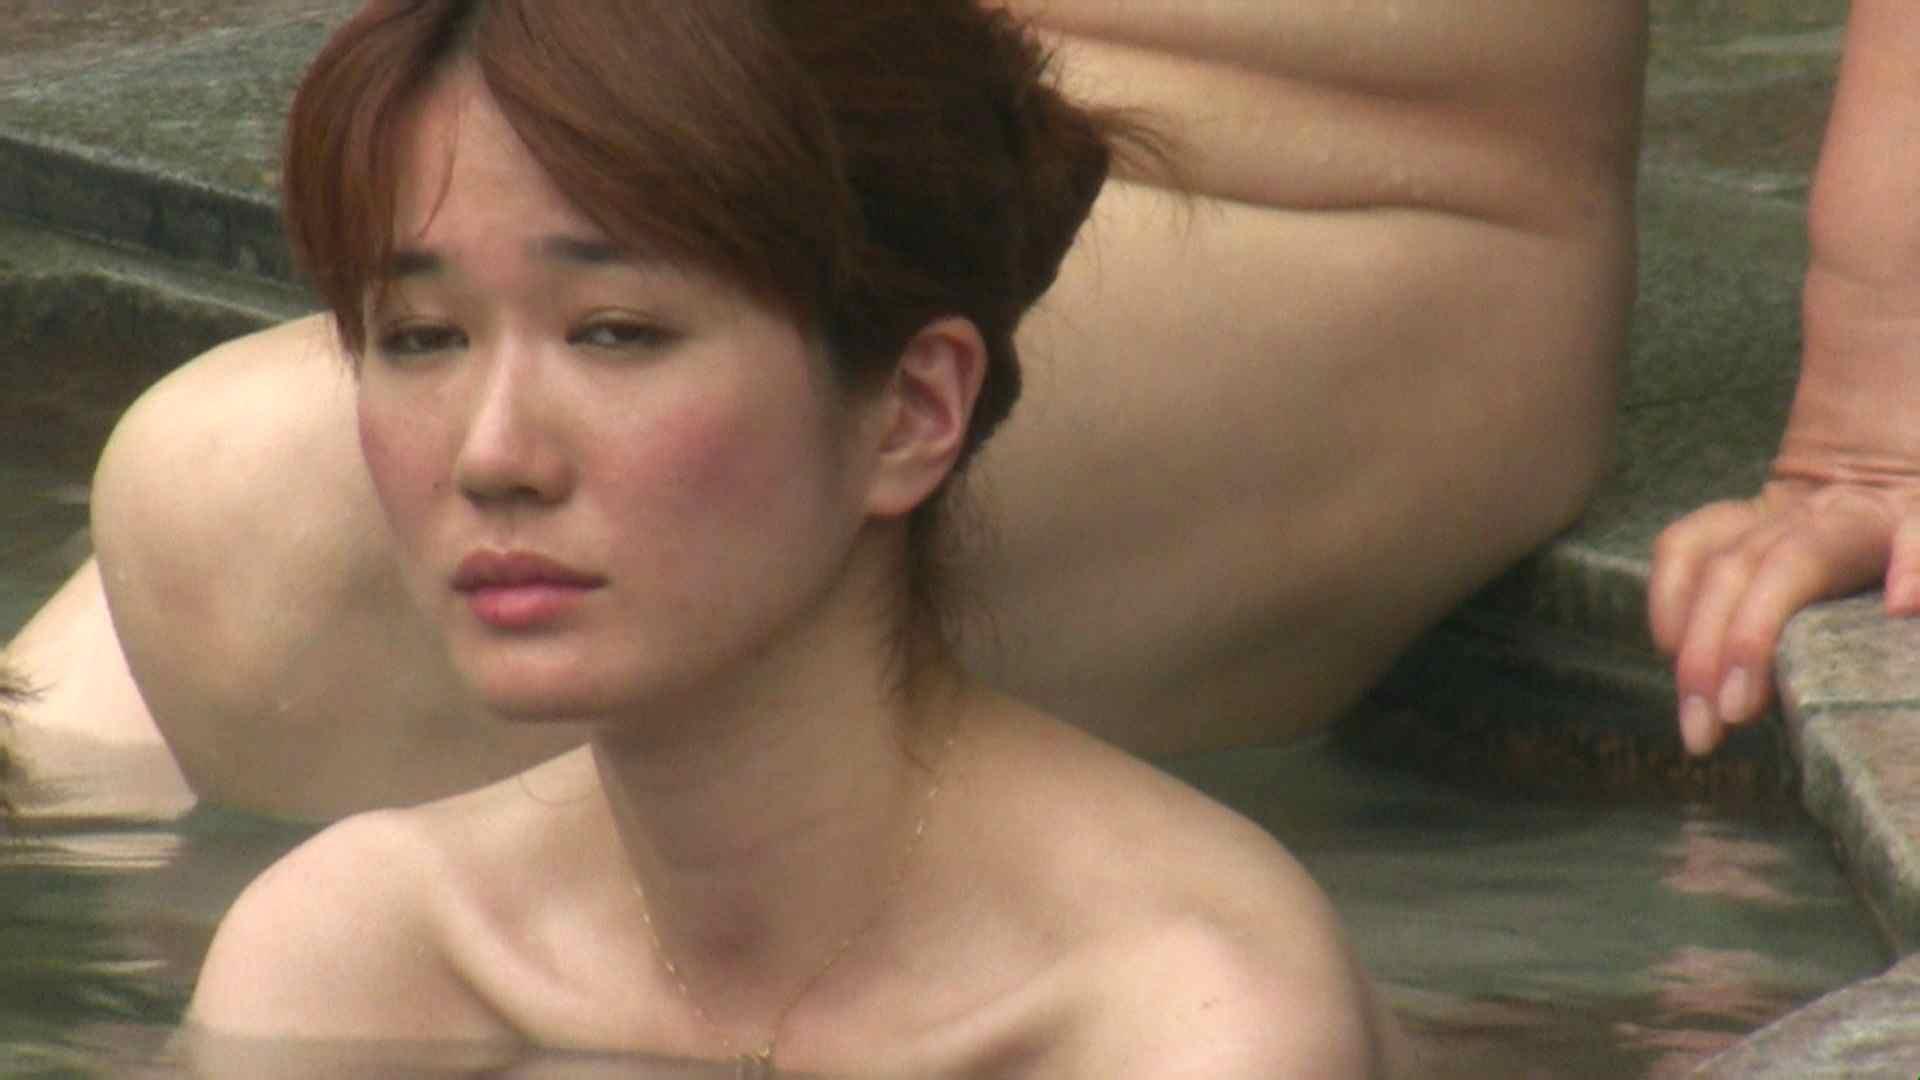 Aquaな露天風呂Vol.110 HなOL | 盗撮  71pic 44